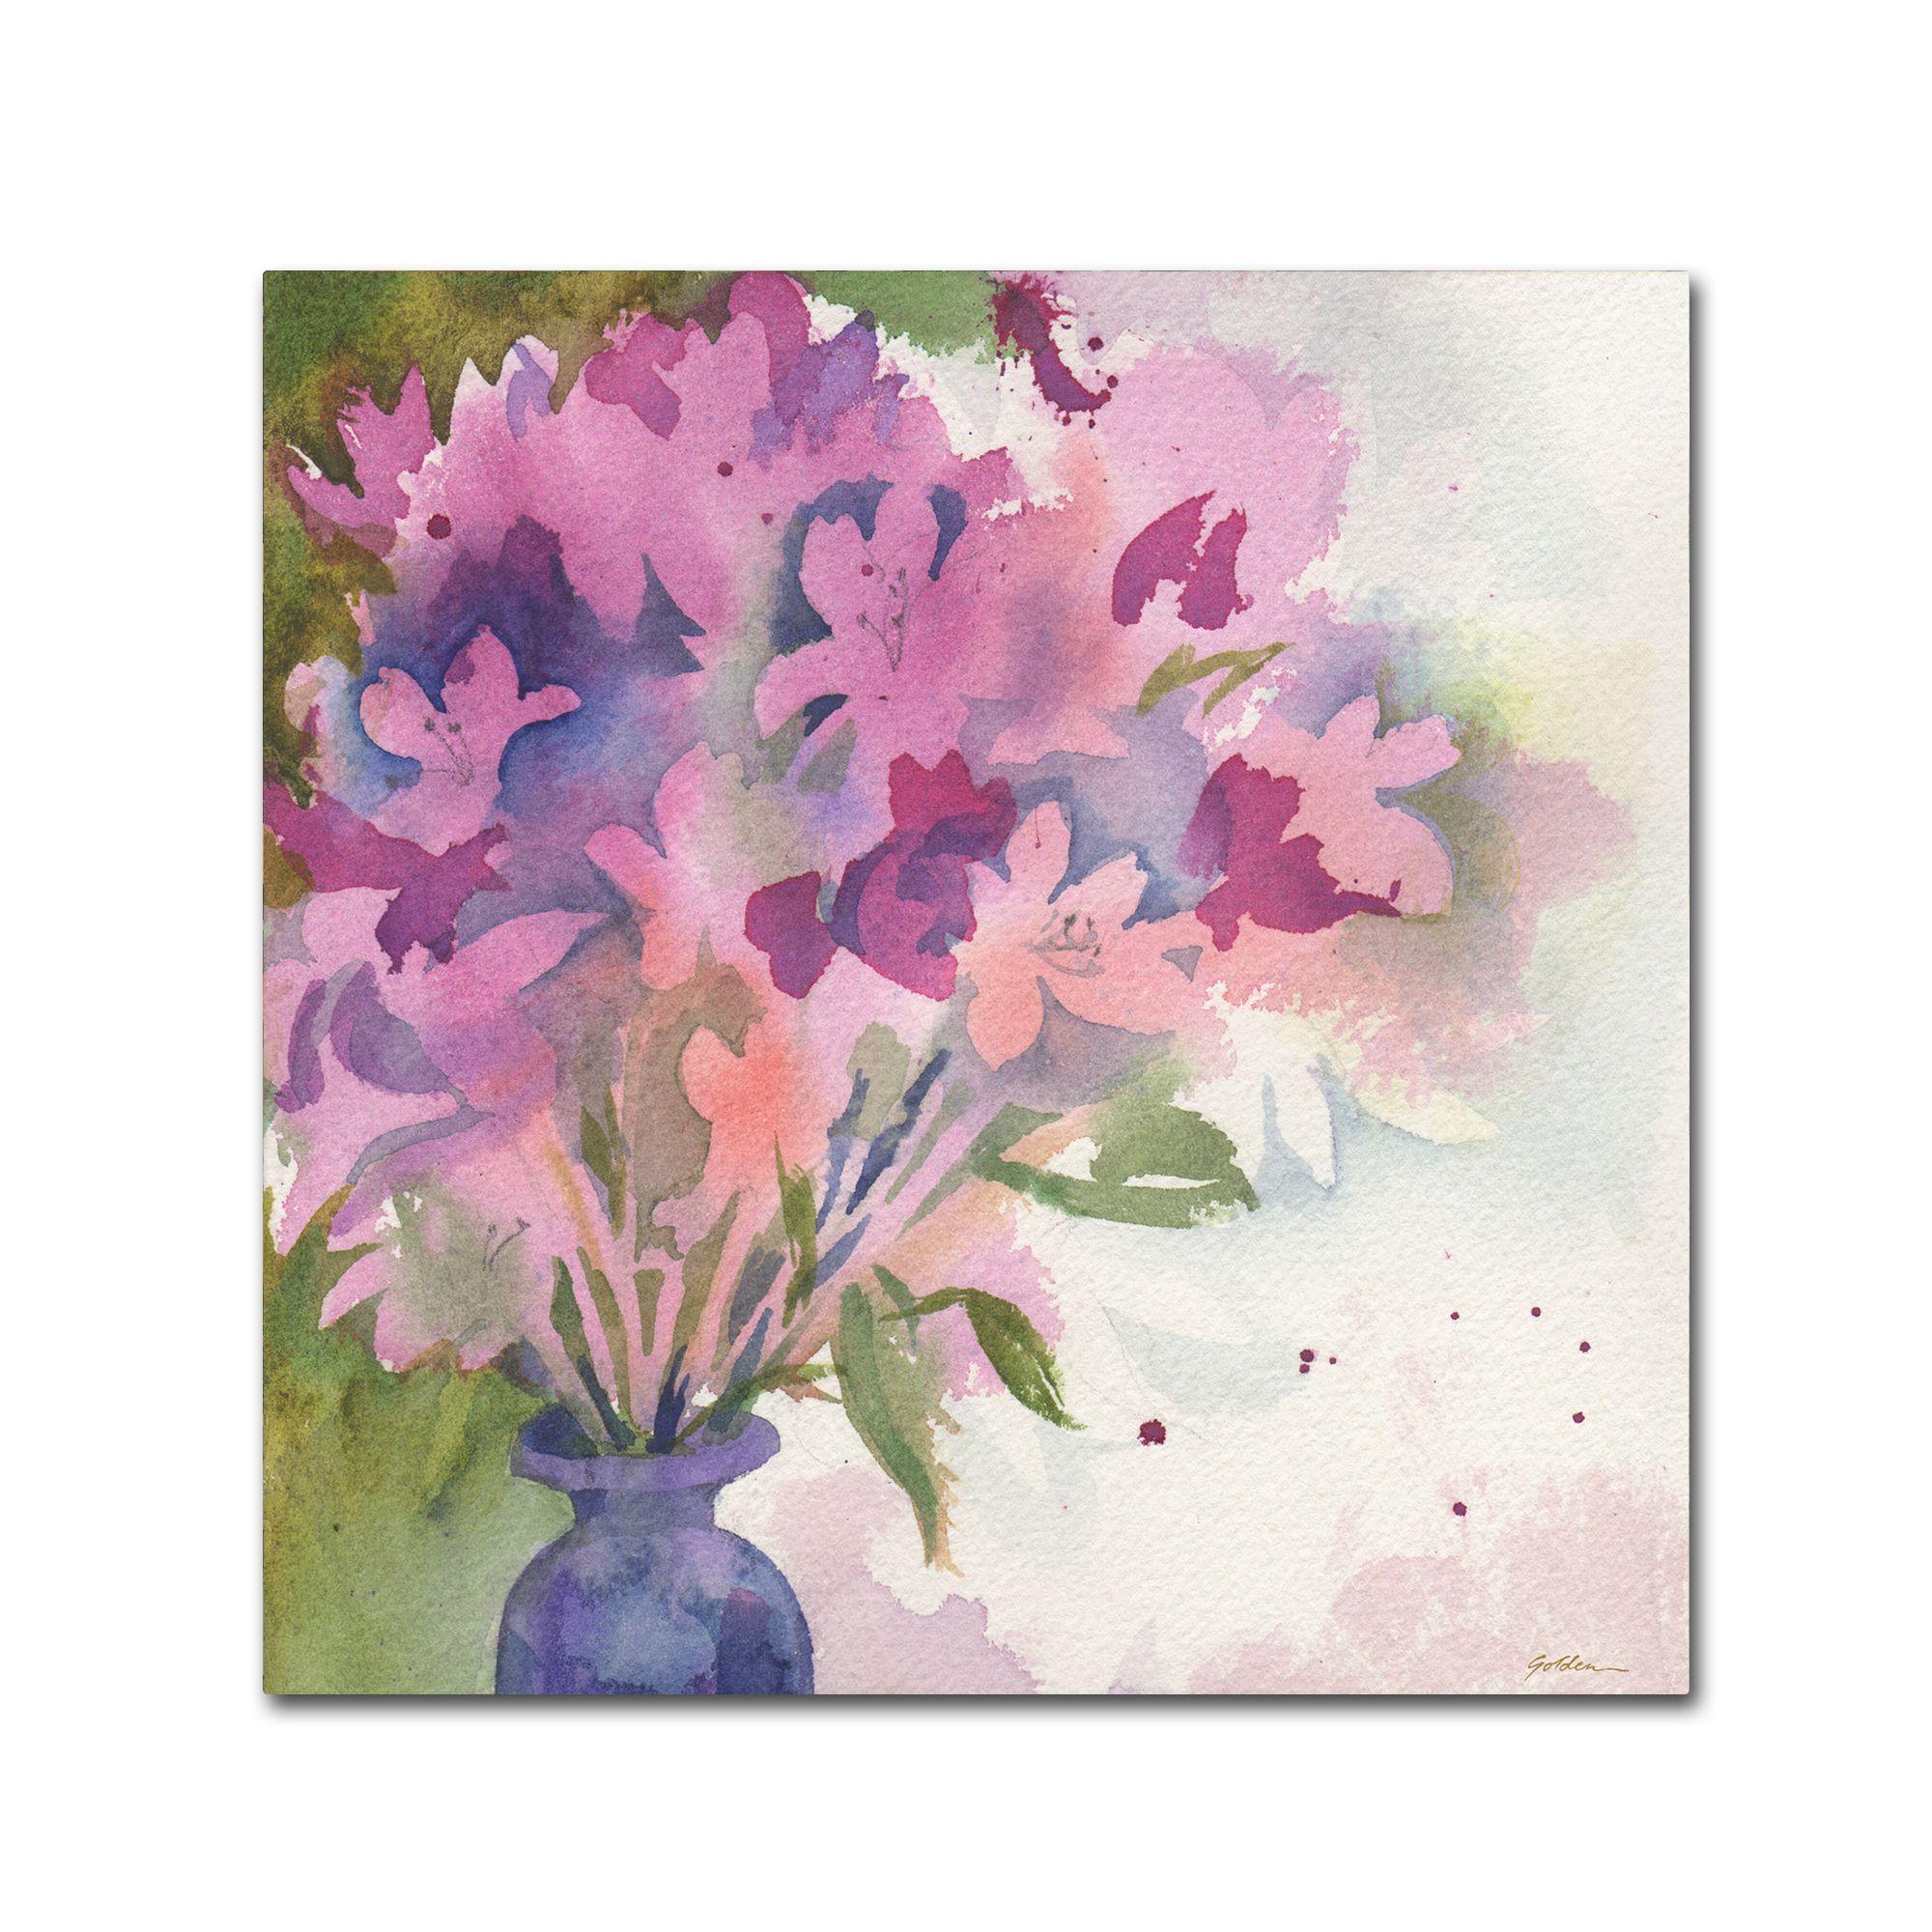 Sheila Golden 'Magenta Blossoms in Vase' Art